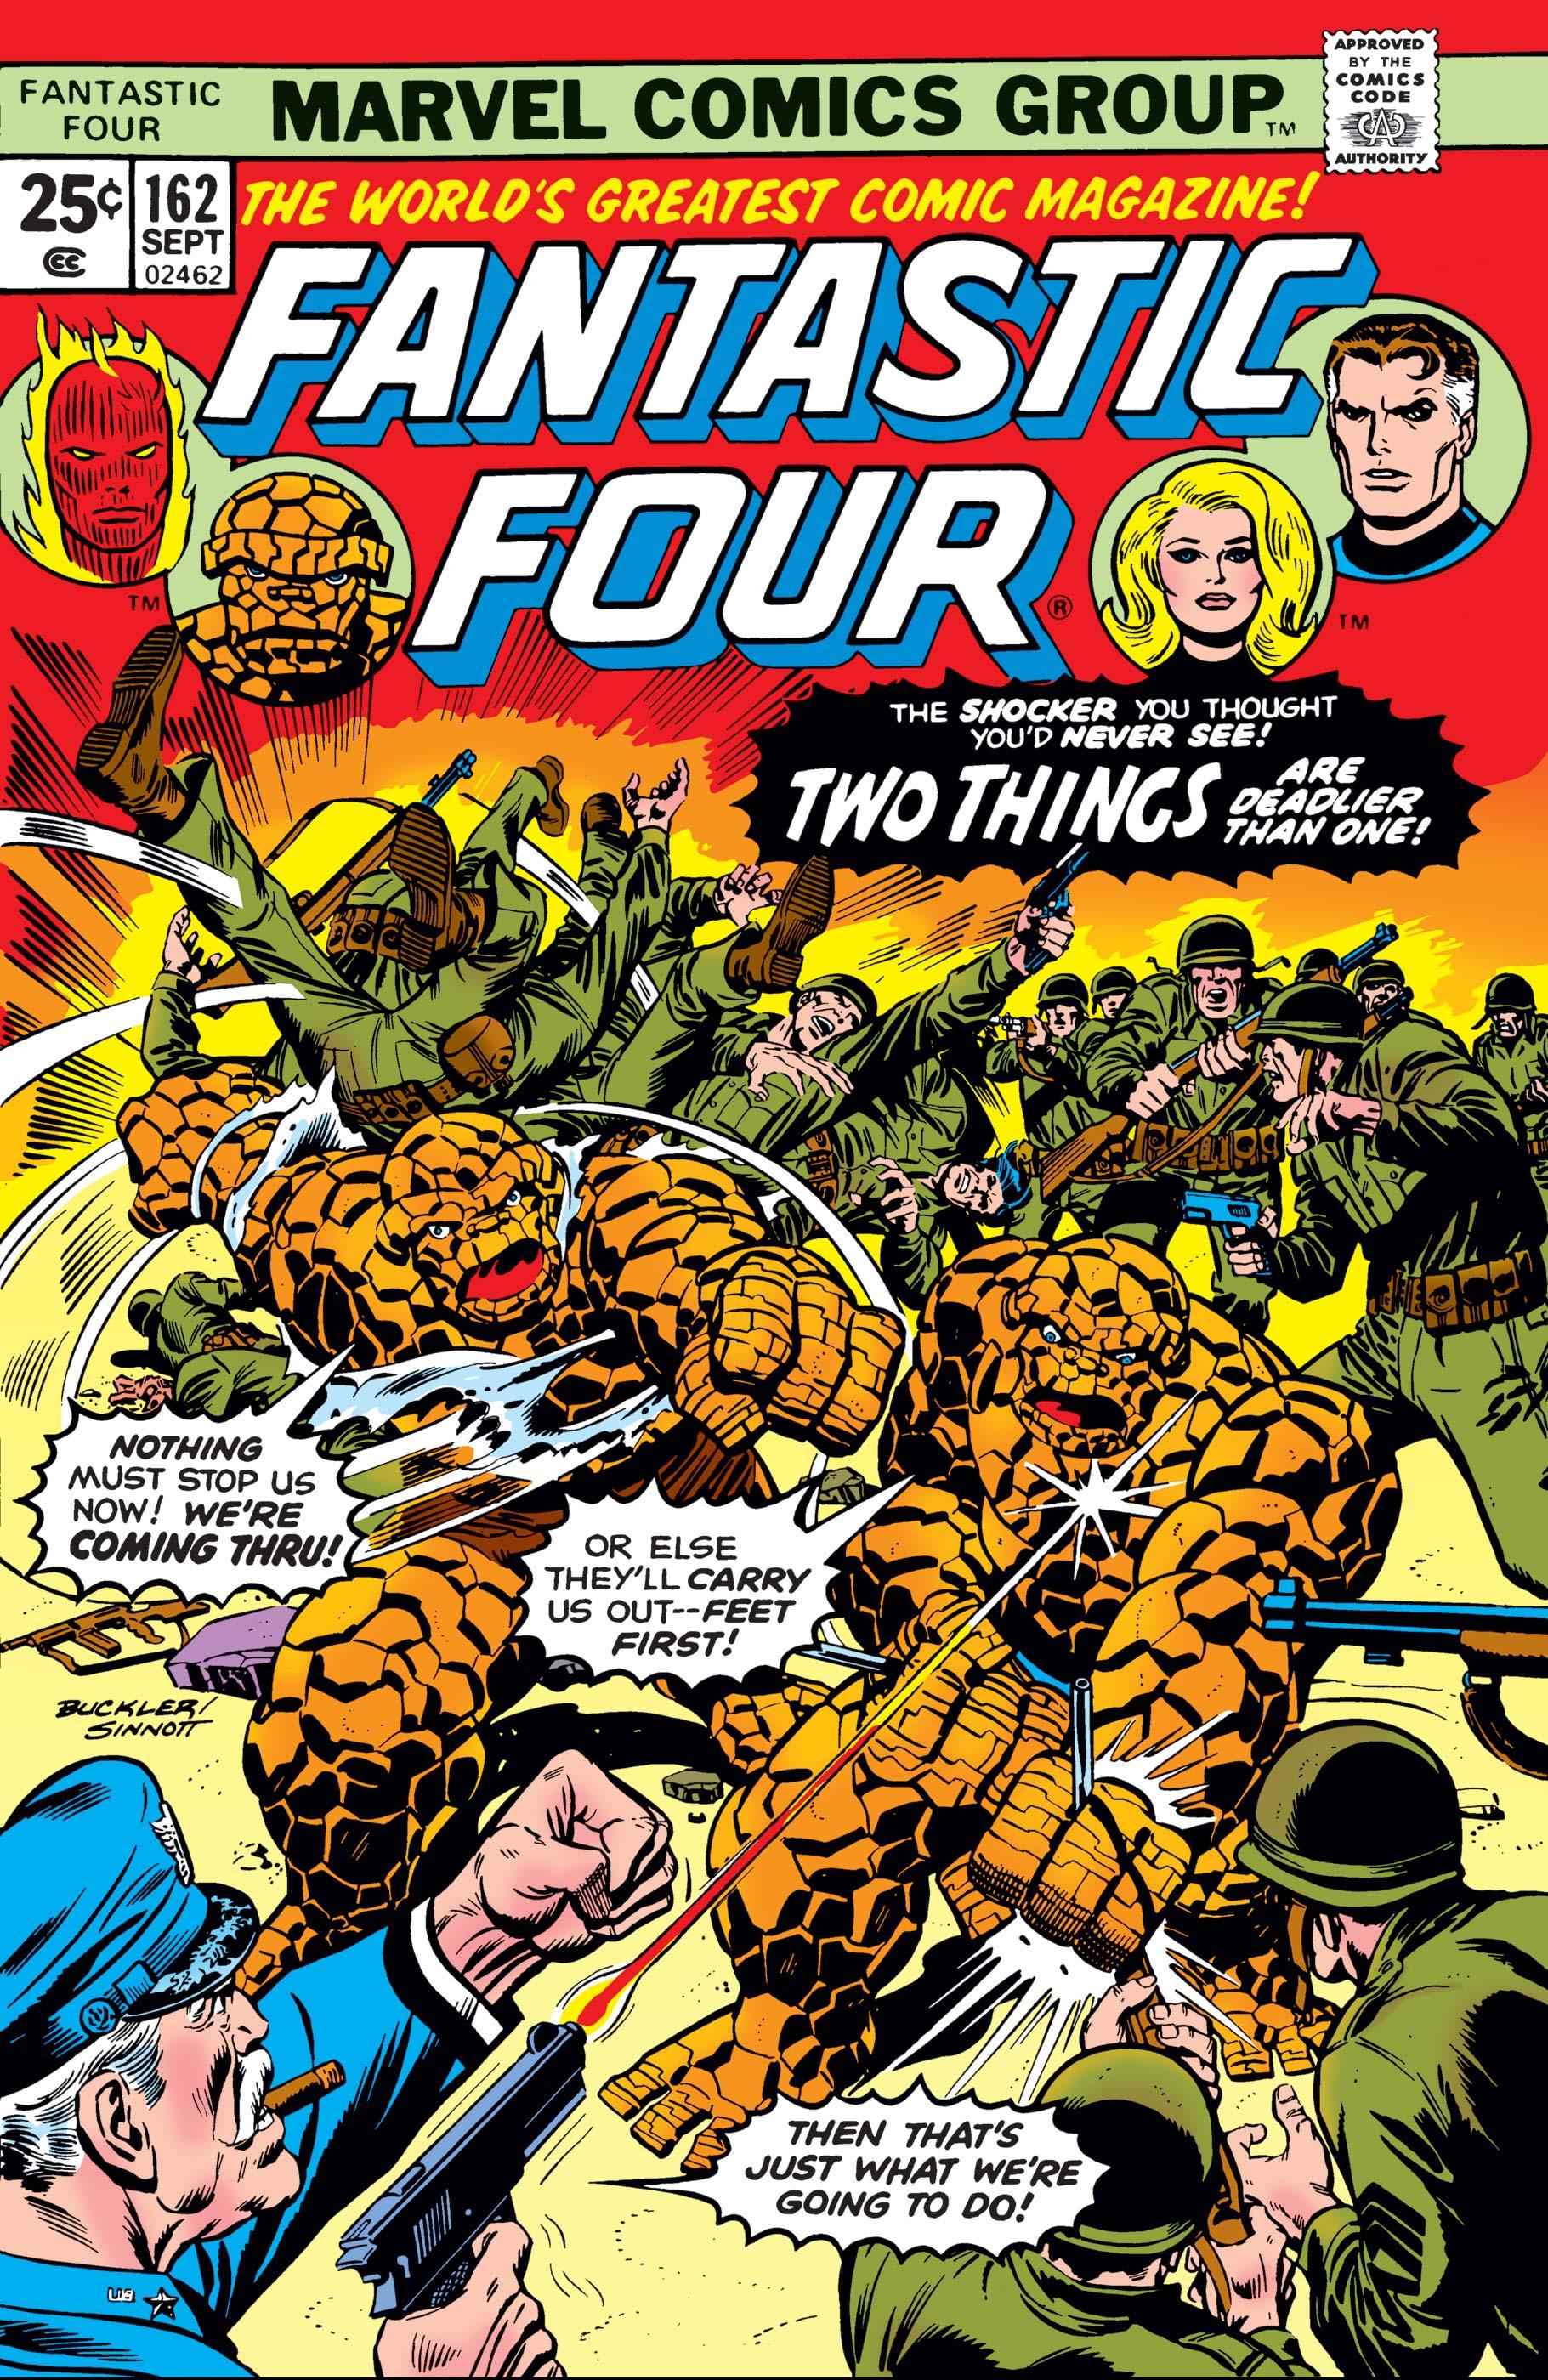 Fantastic Four (1961) #162